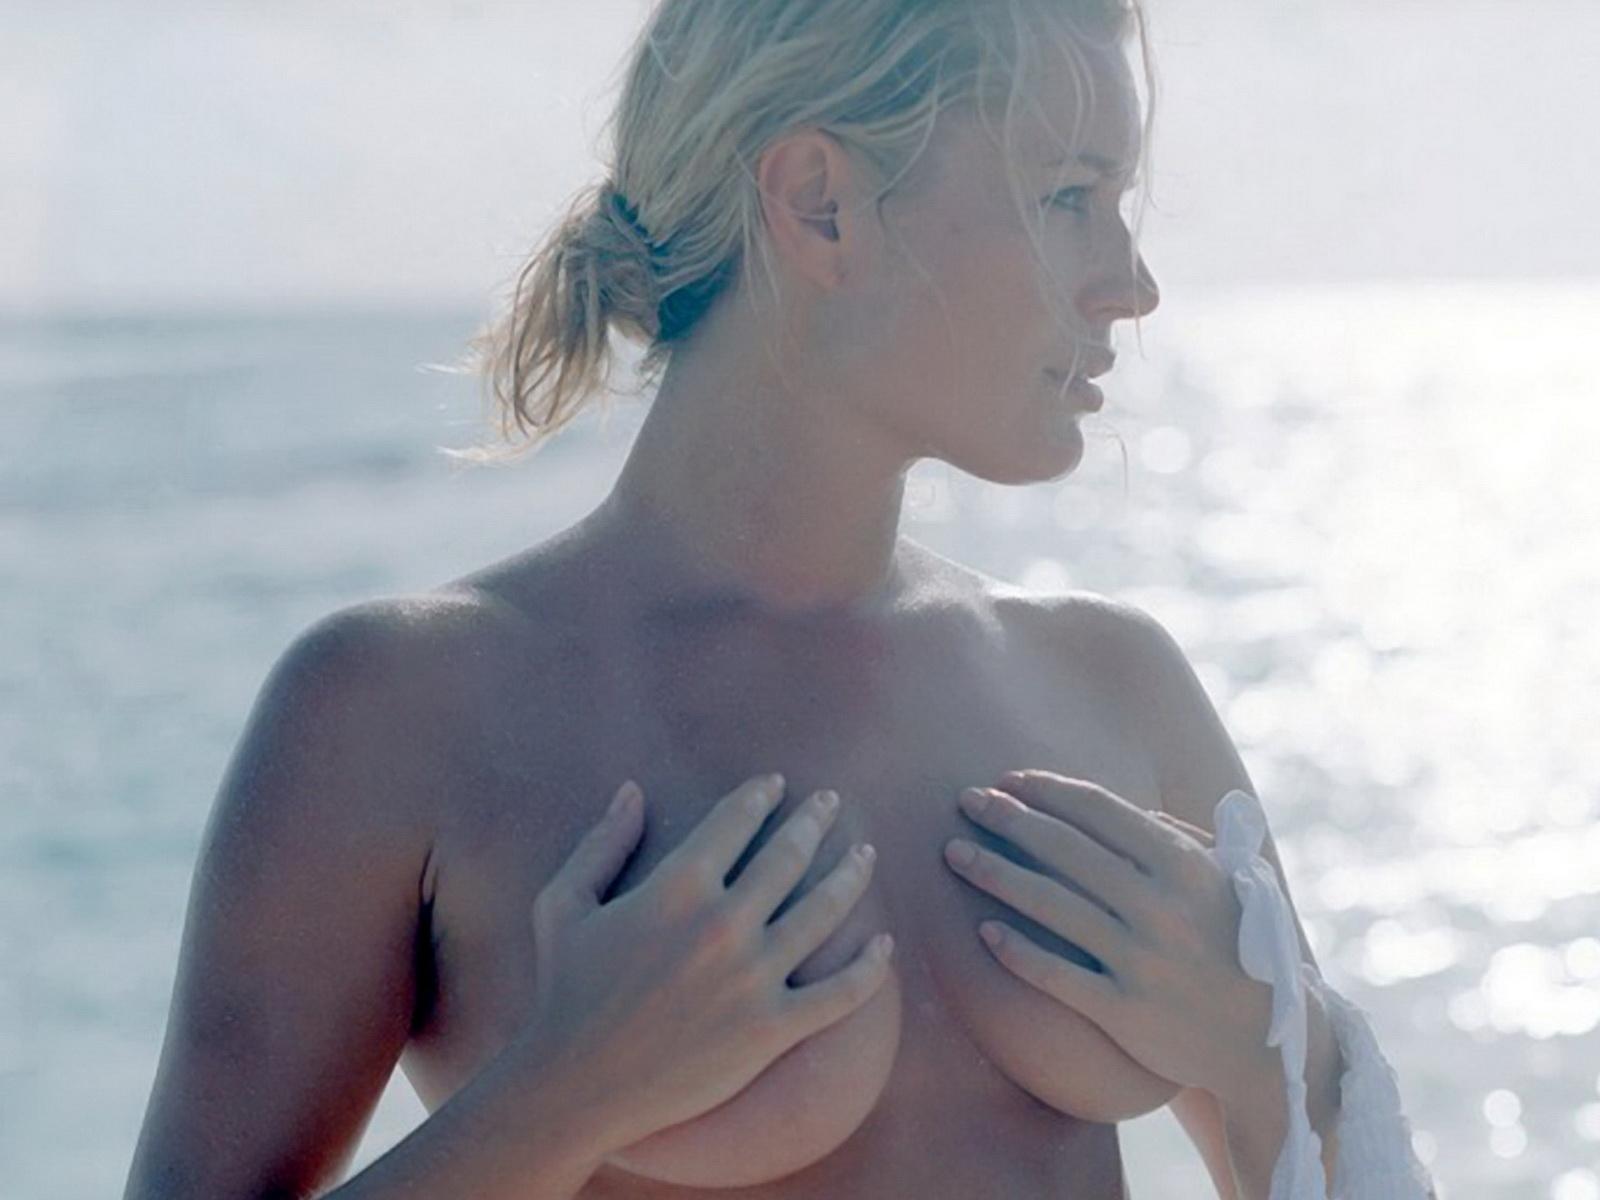 http://1.bp.blogspot.com/-HGct_EzzUiQ/T2qALxLKWlI/AAAAAAAAAjs/g_G9ijLPFnQ/s1600/Rebecca+Romijn+in+see+through+dress+on+set+Sports+Illustrated++Swimsuit+Exposure.jpg